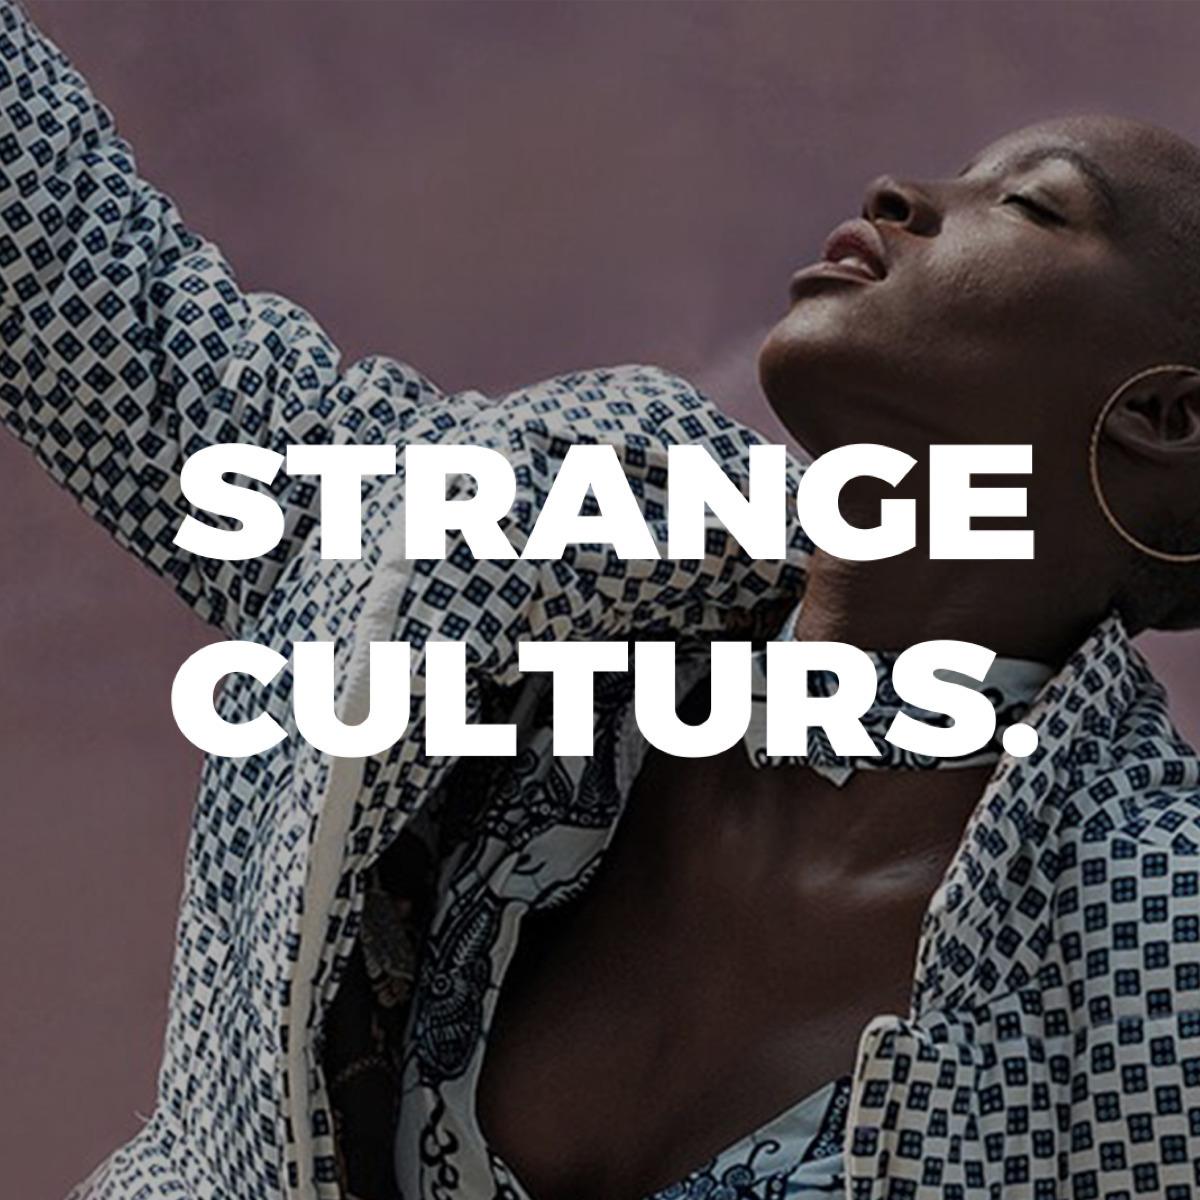 Strangeculturs Magazine